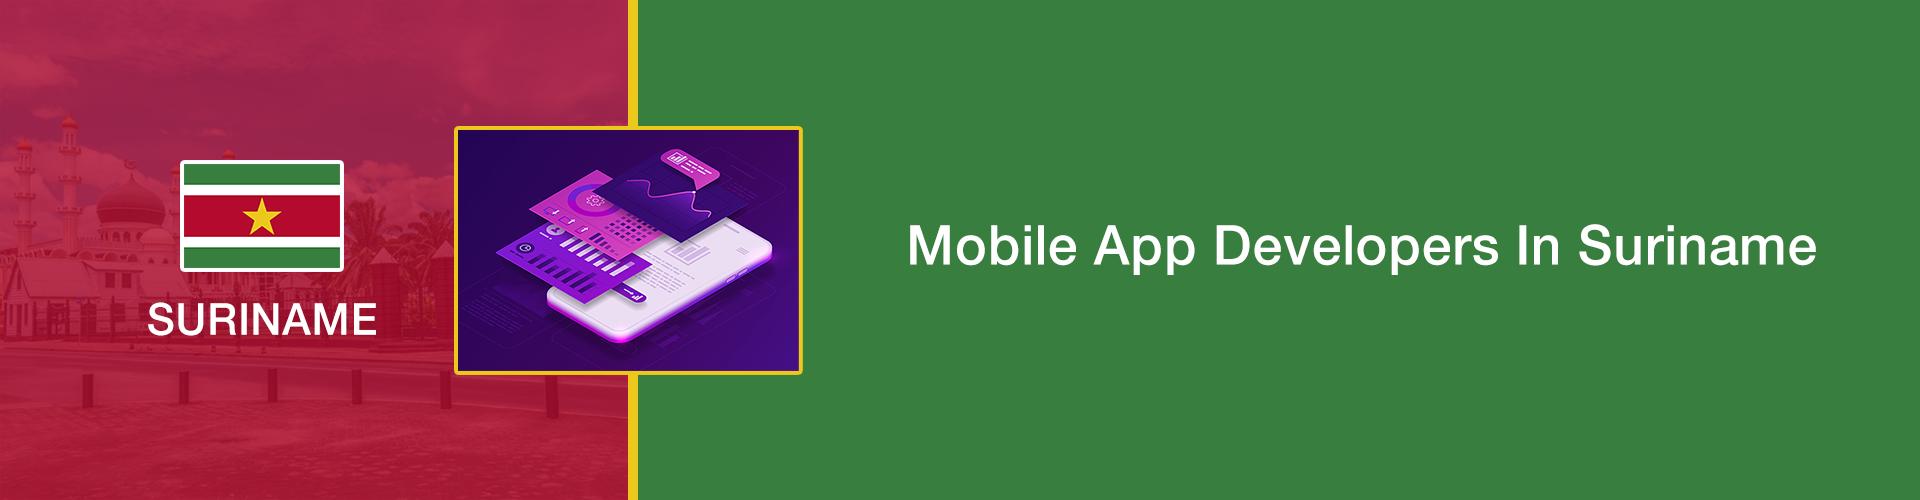 mobile app development suriname